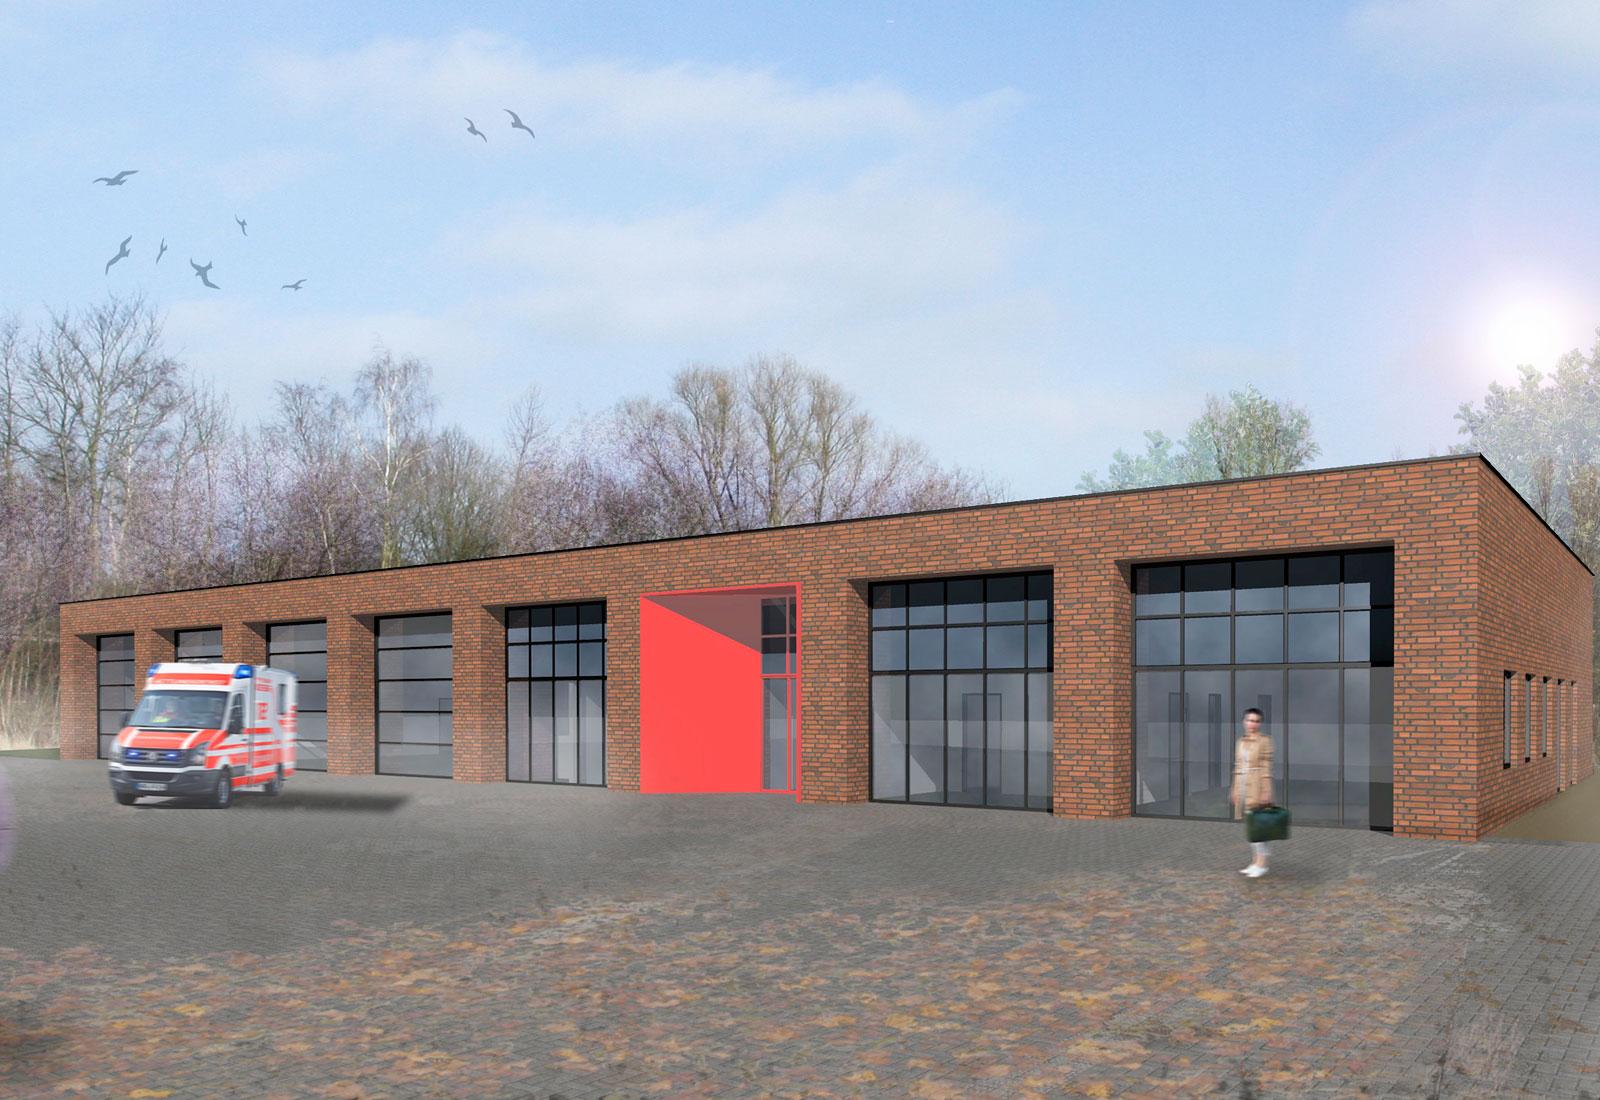 Rettungswache Heimerzheim Neubau Rettungswache, Architekt Bonn